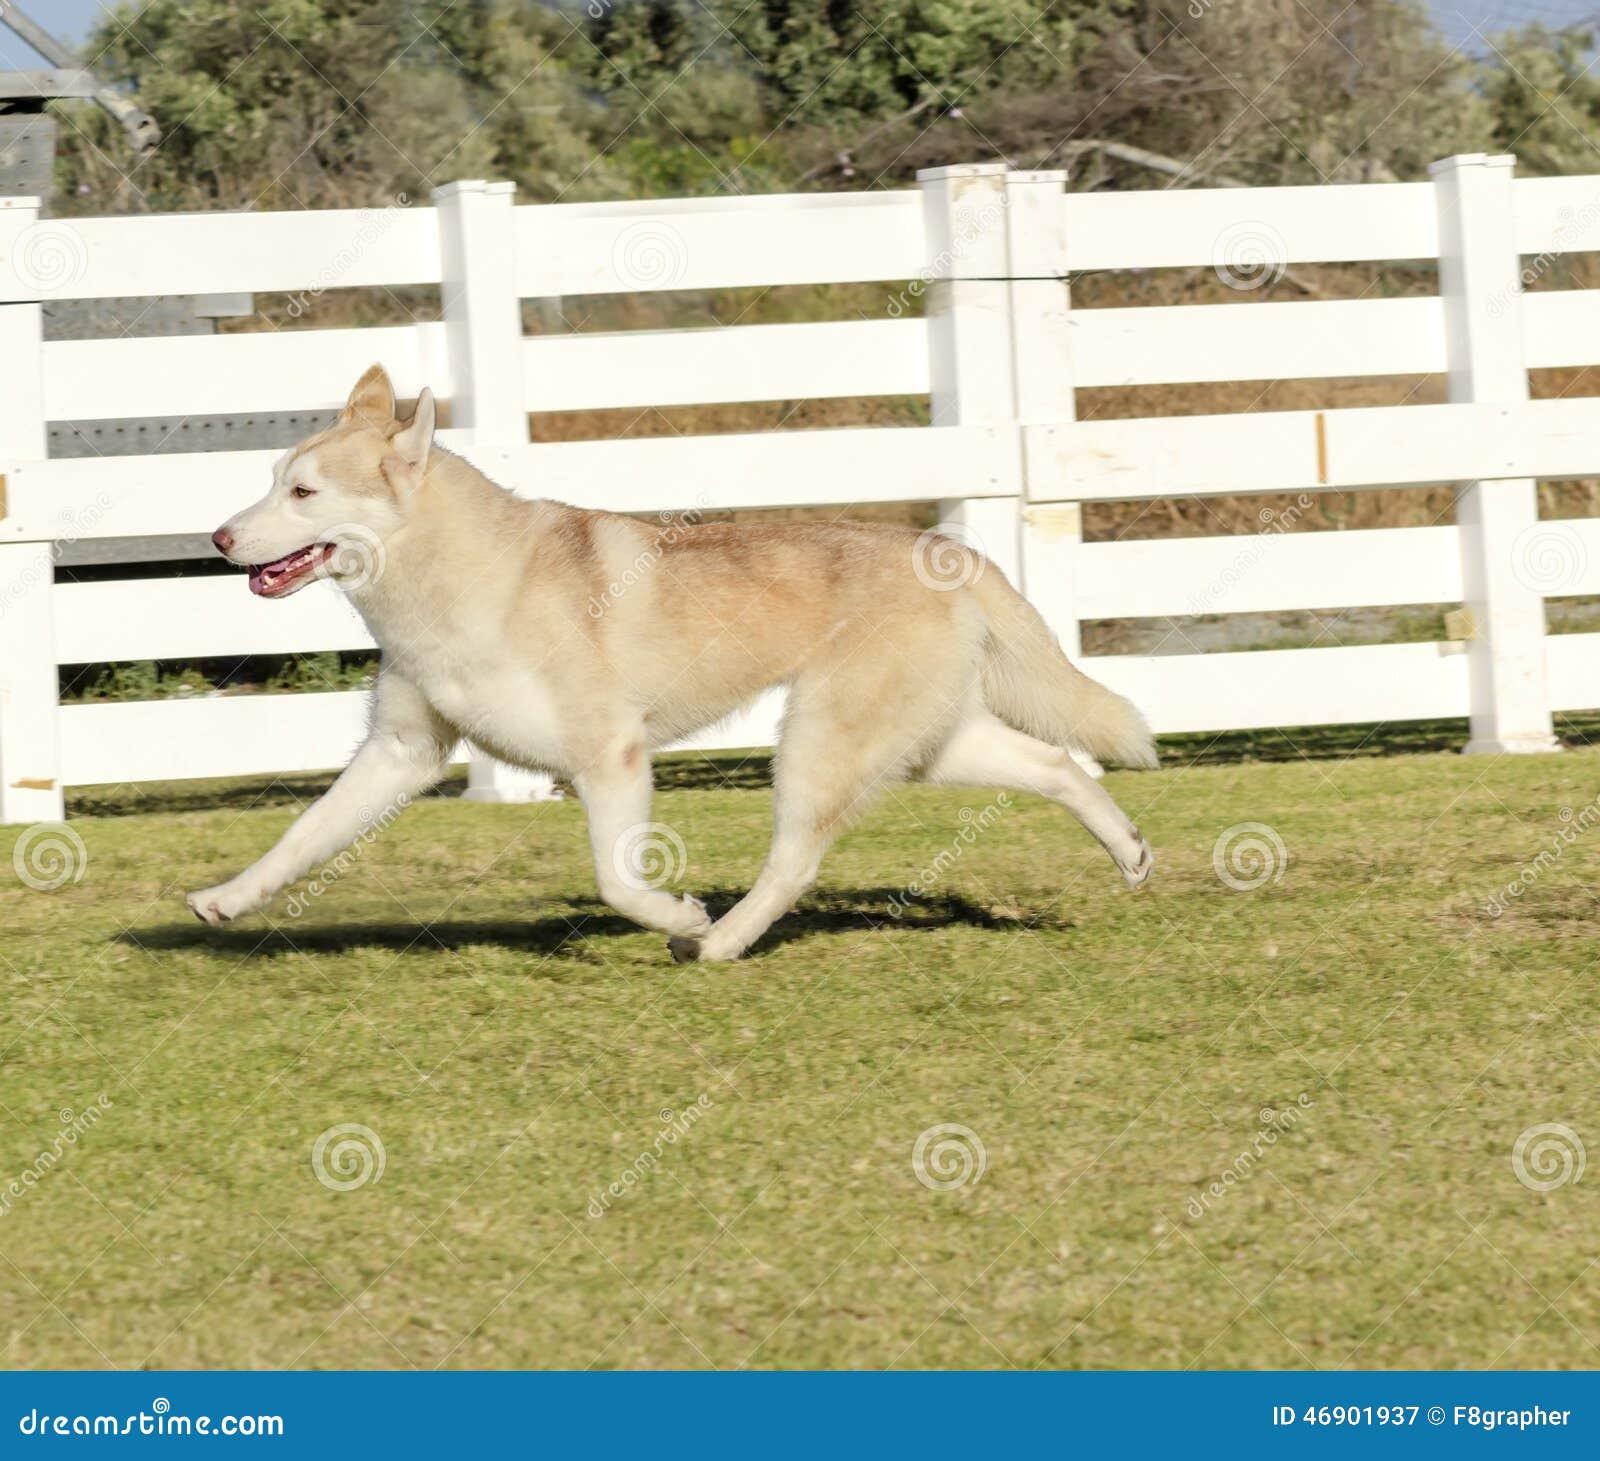 Siberian Husky Stock Image Image Of Healthy Intelligent 46901937